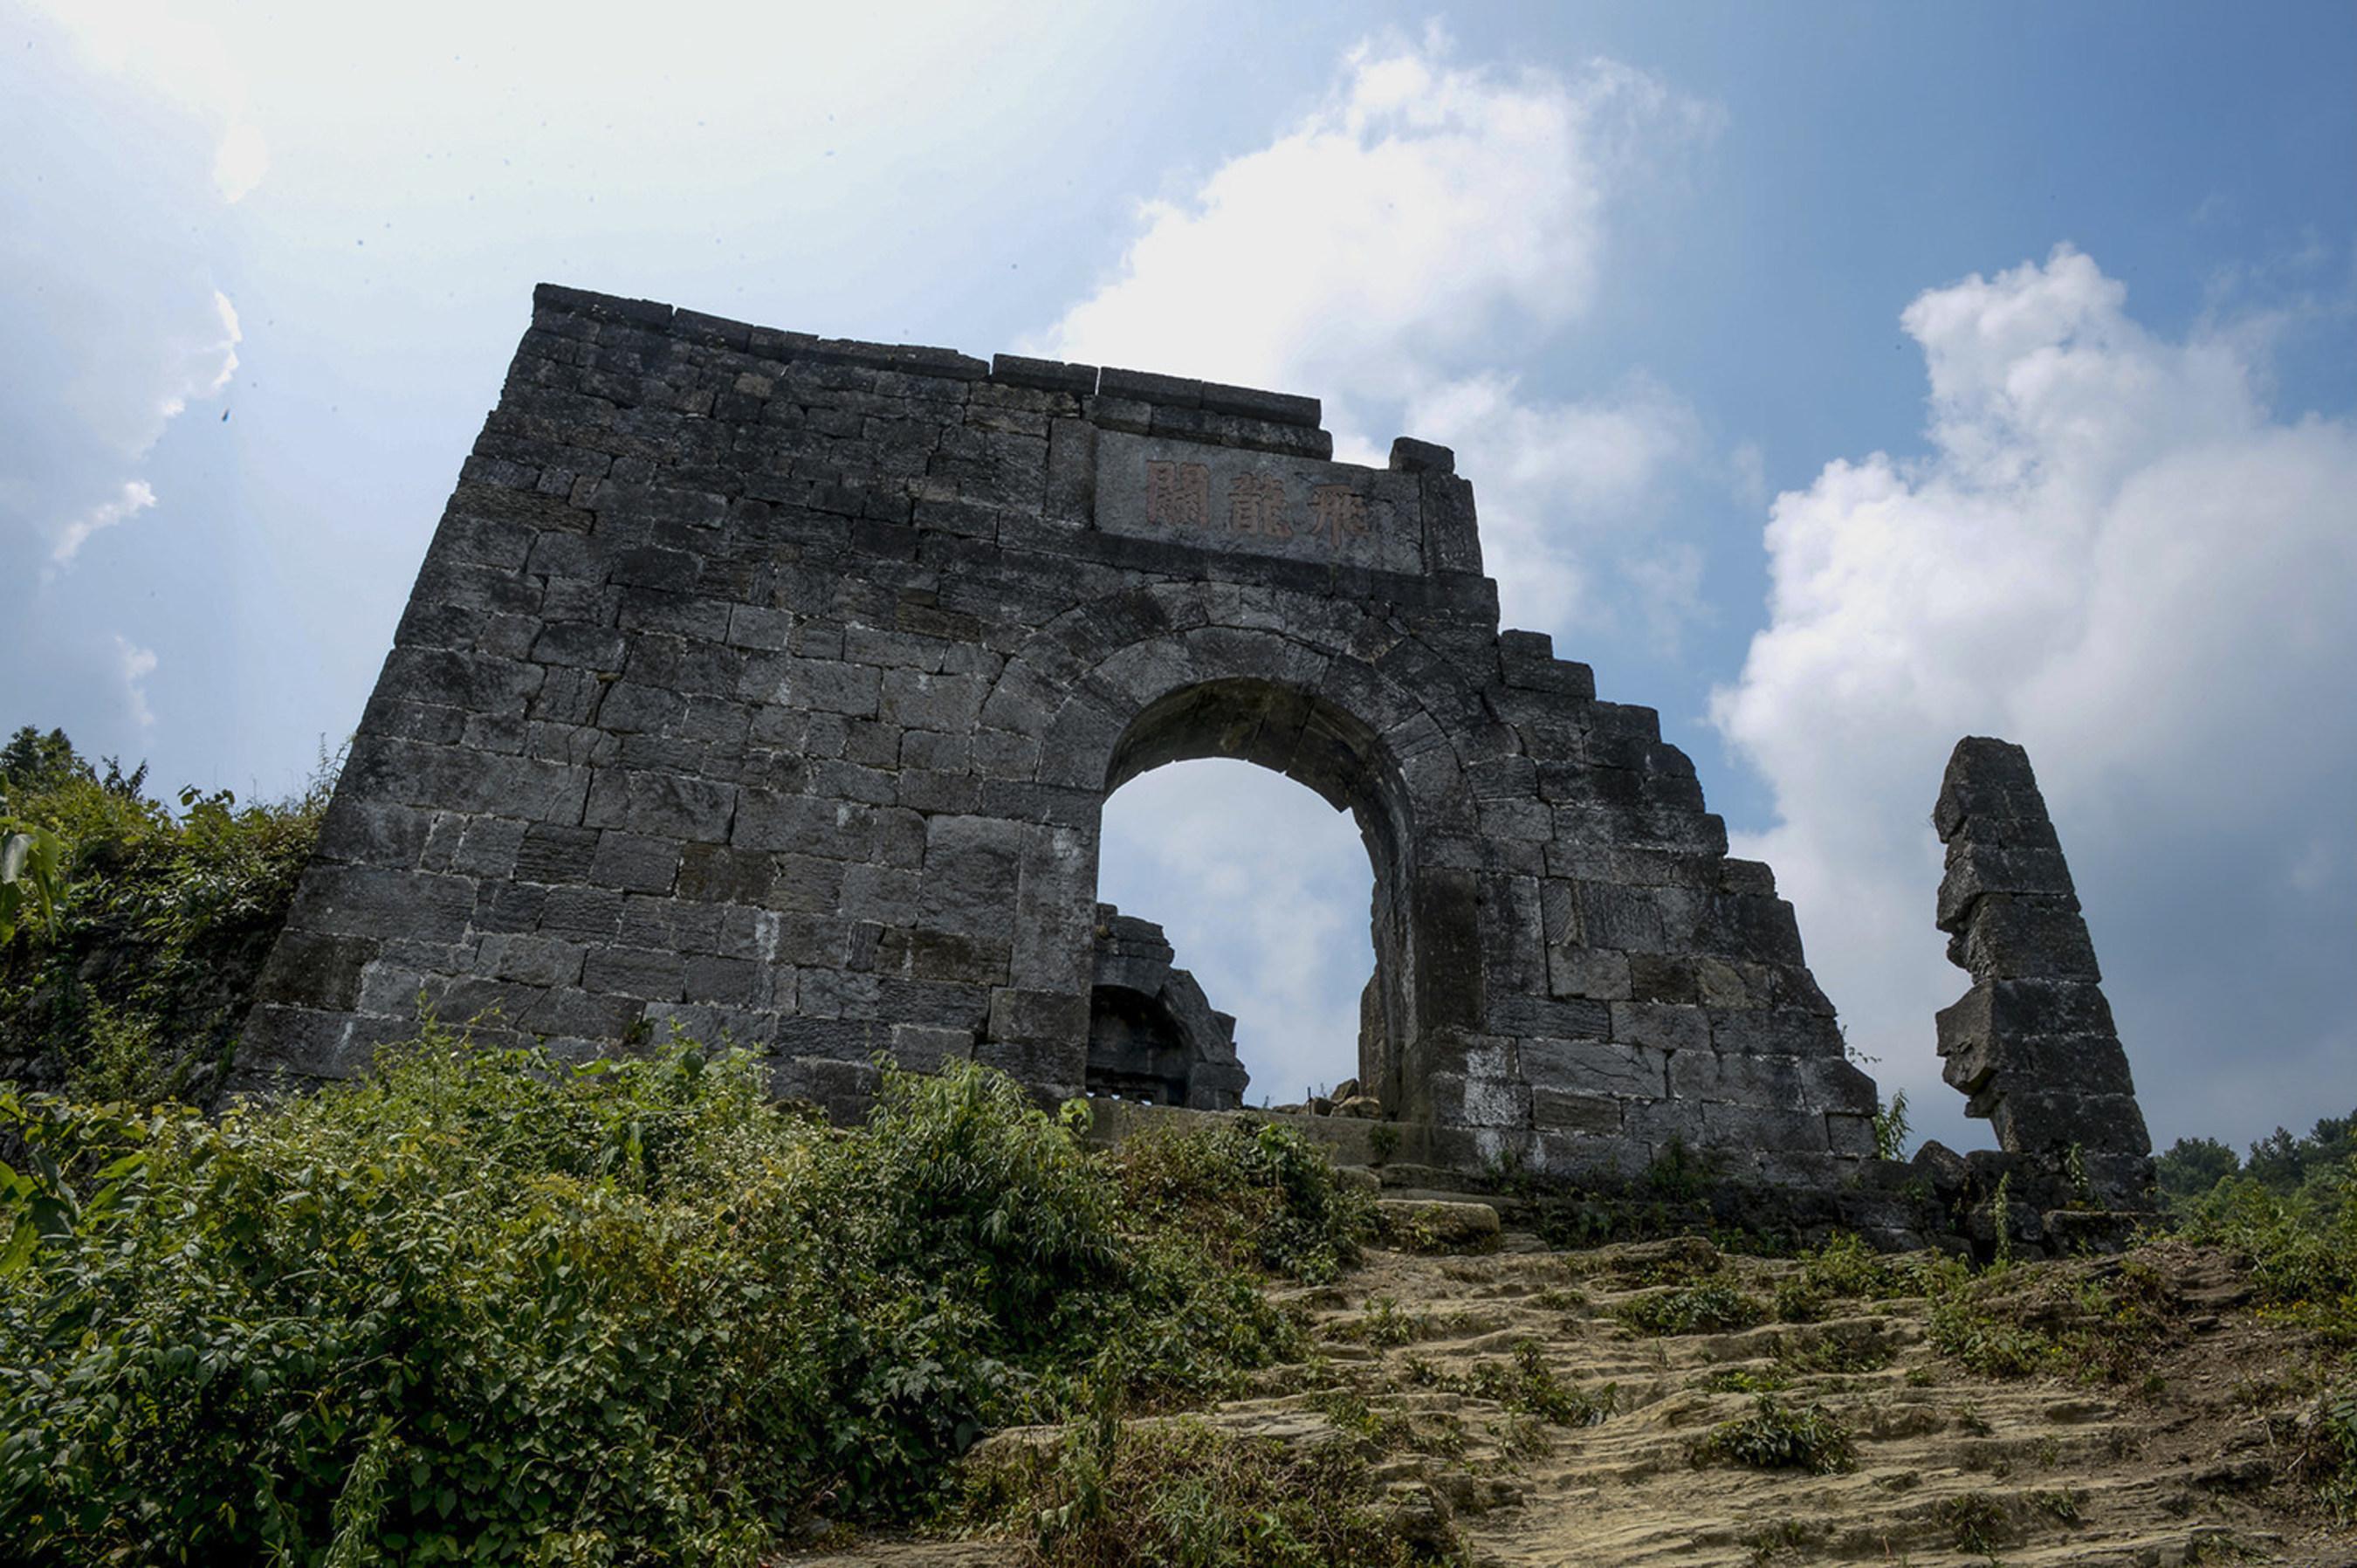 Schloss Hailongtun wird zum ersten Weltkulturerbe in Chinas Guizhou Provinz ernannt